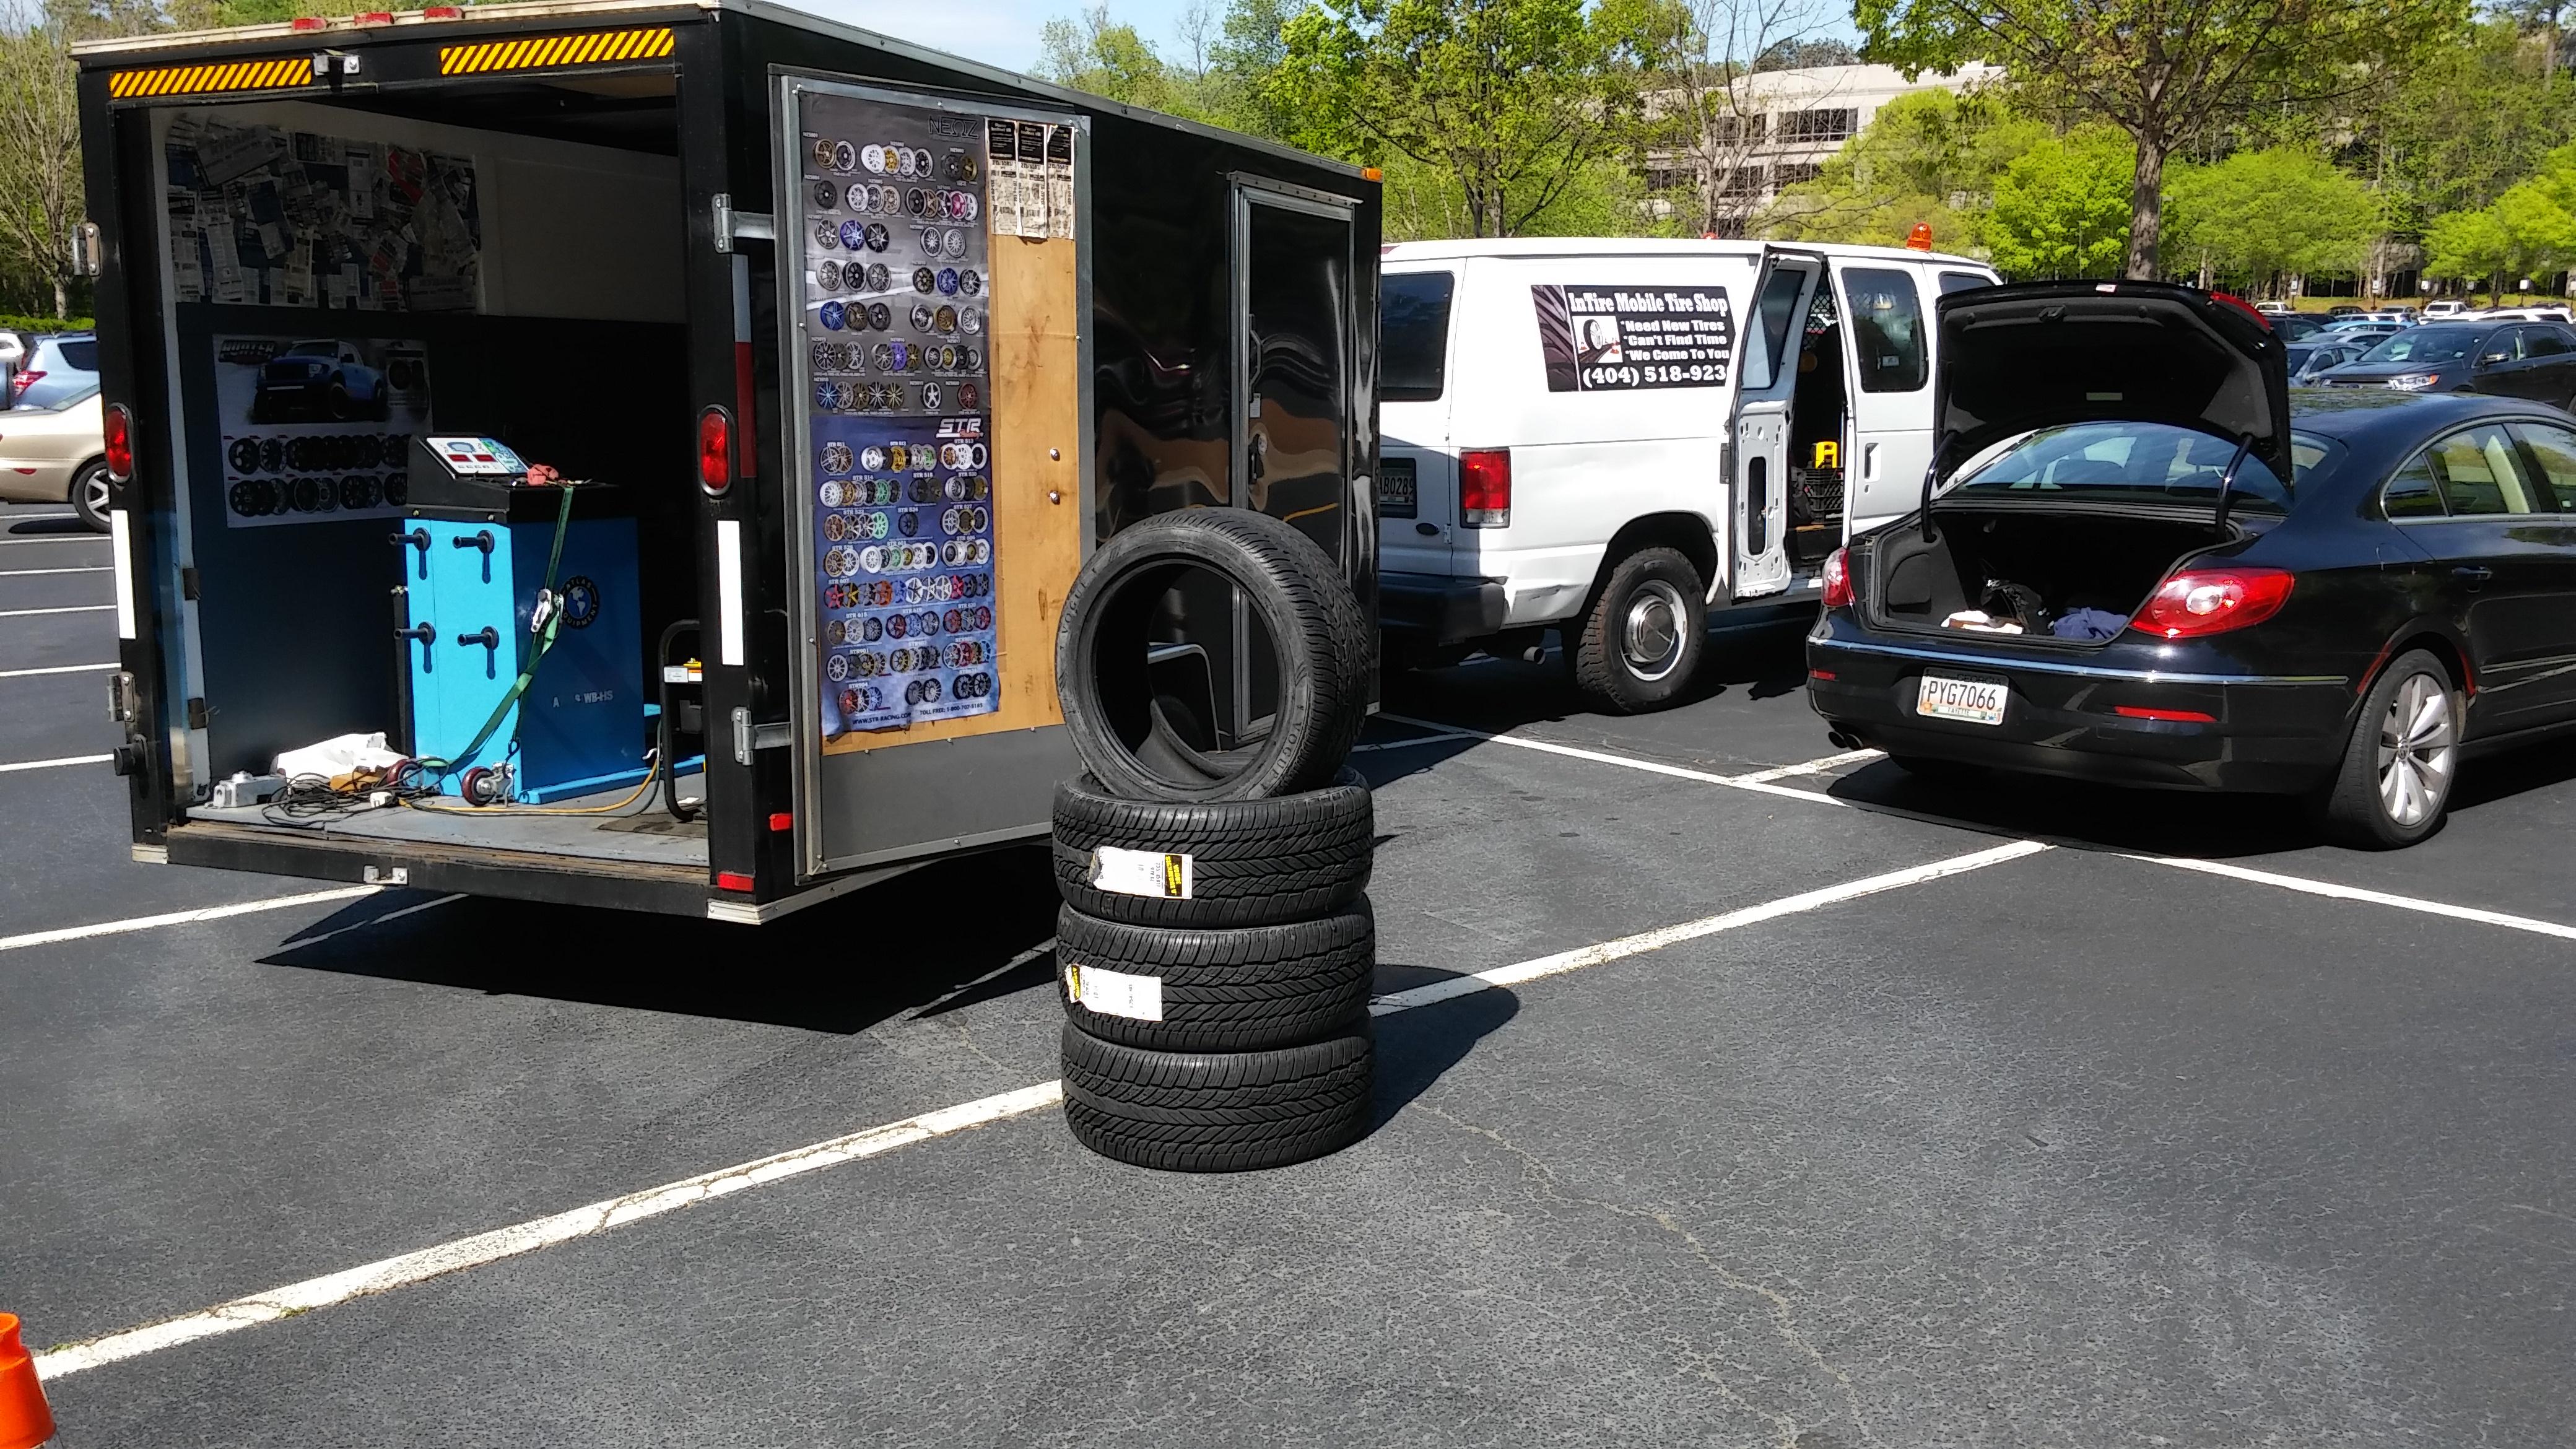 Nearest Used Tire Shop >> Mobile Tire Shop New Tires Atlanta Intire Mobile Tire Shop